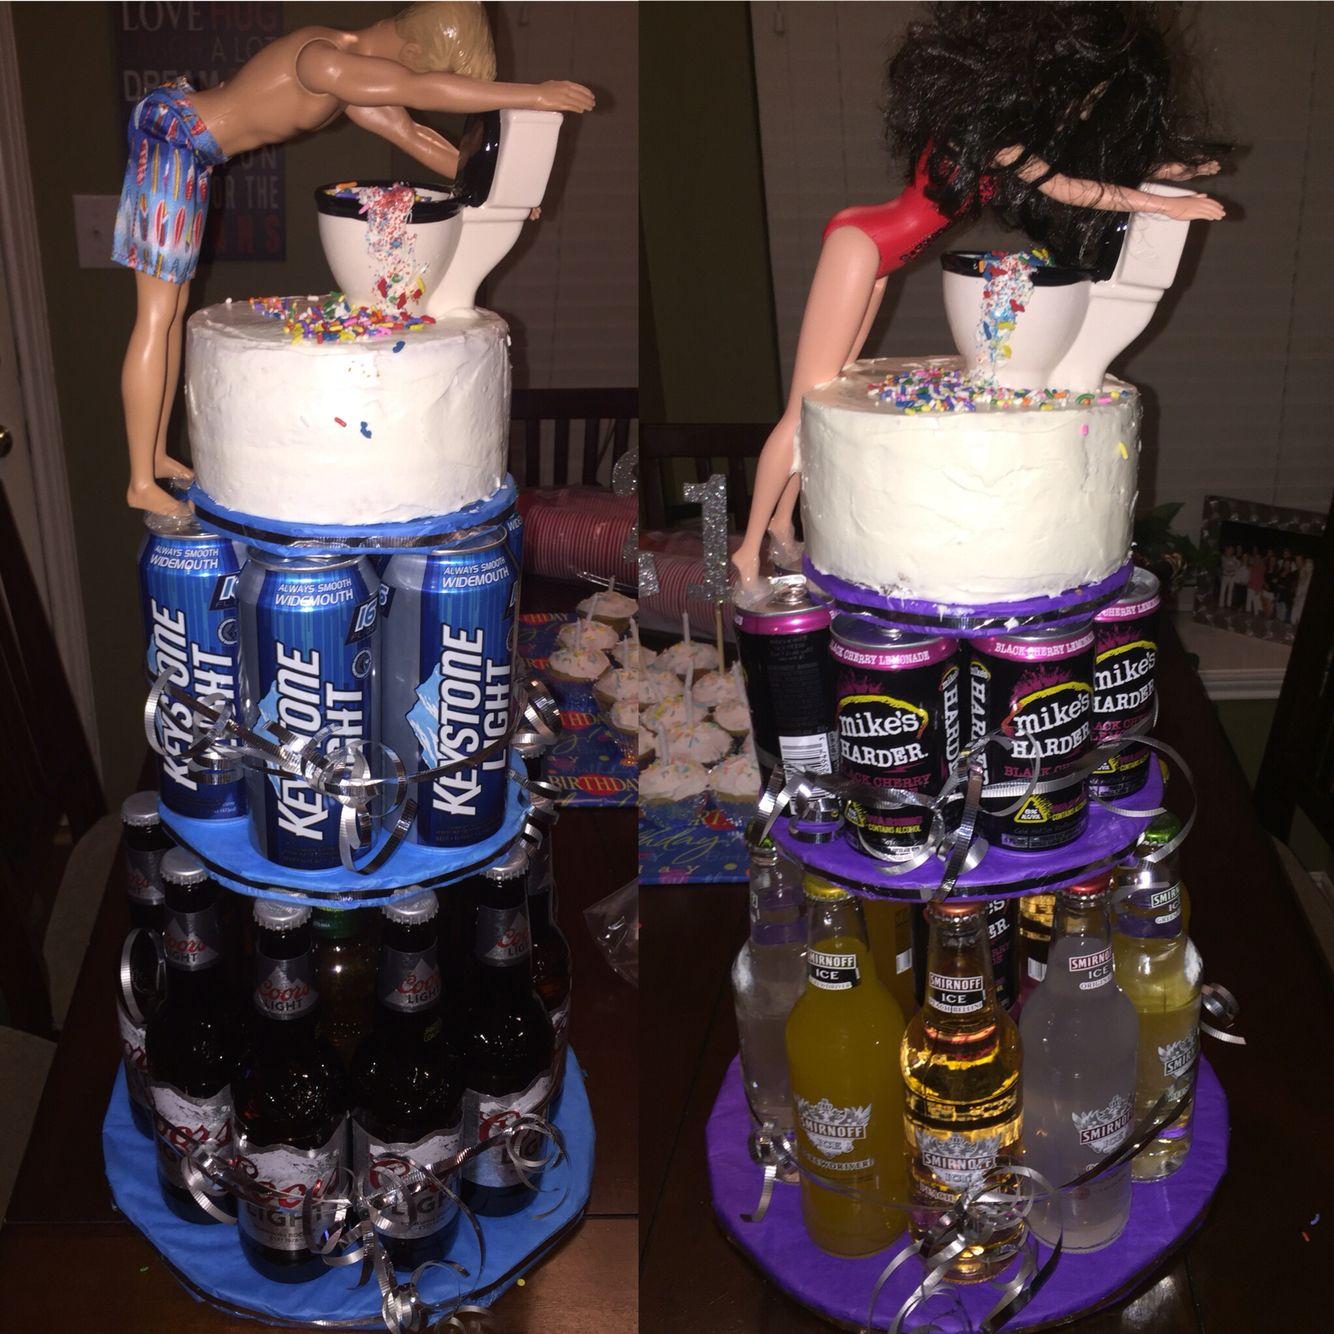 My Boyfriends And Best Friends 21st Birthday Cakes